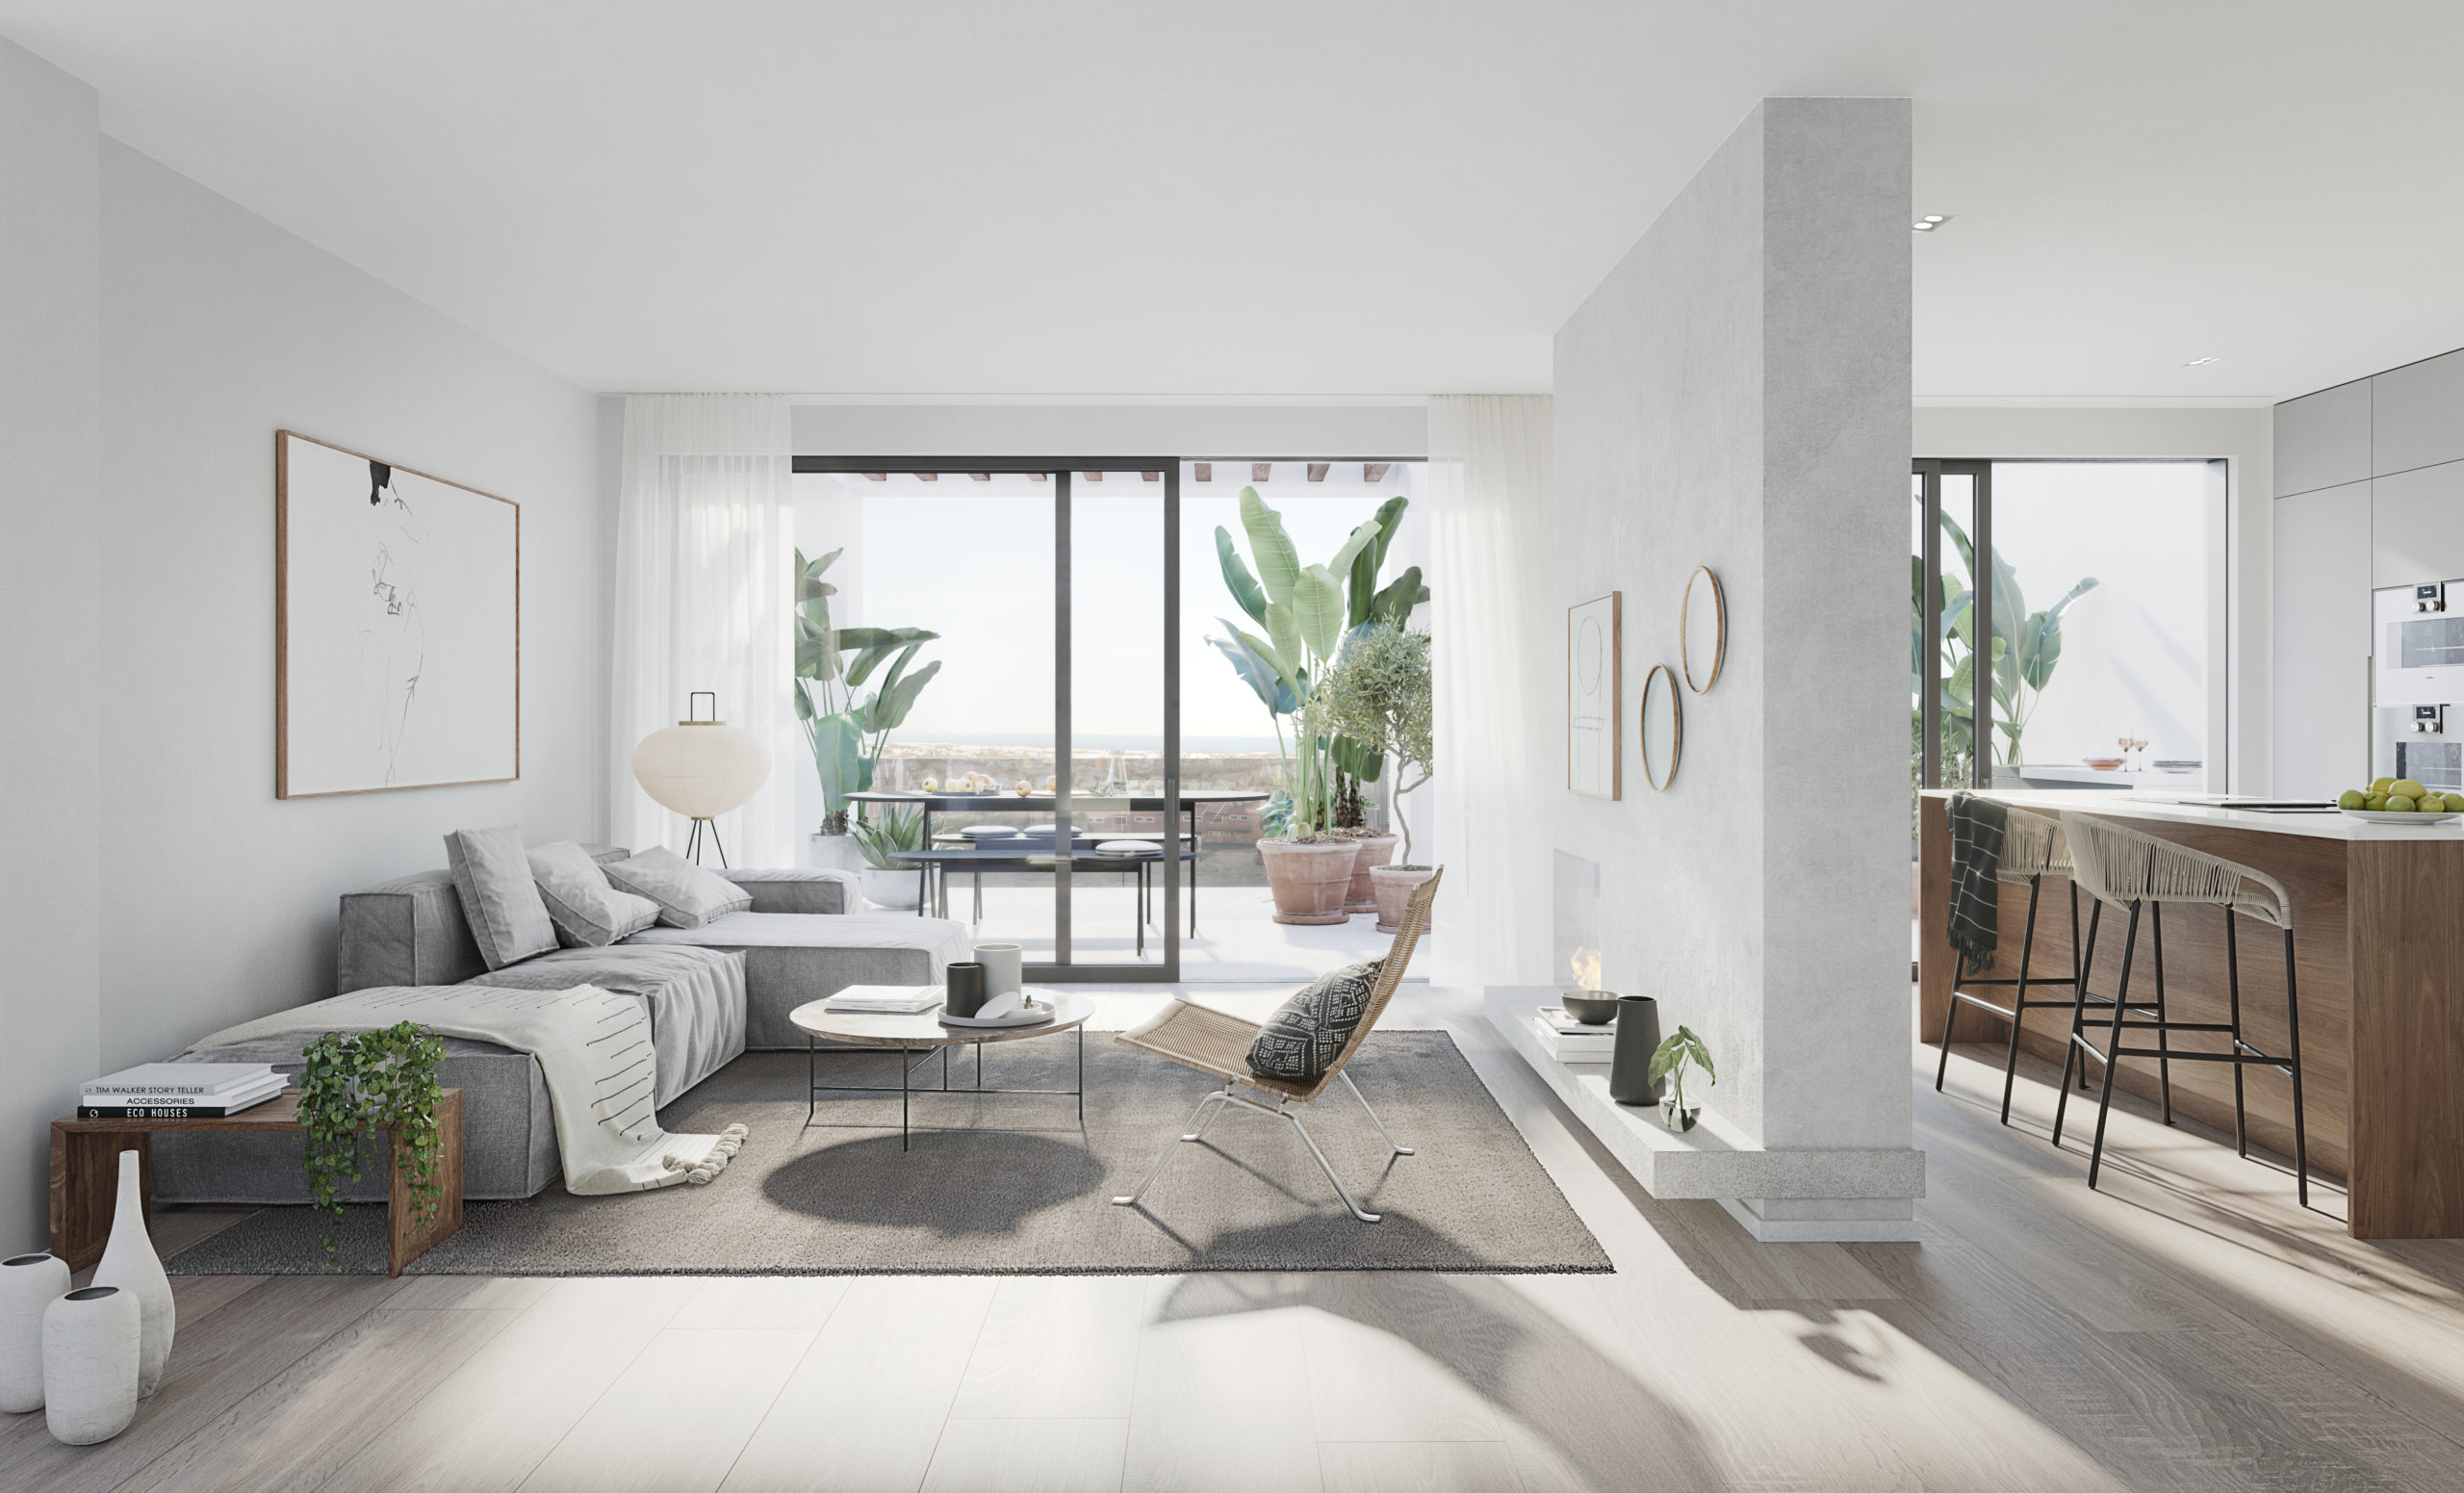 Ocean_View_Livingroom_High-resolution